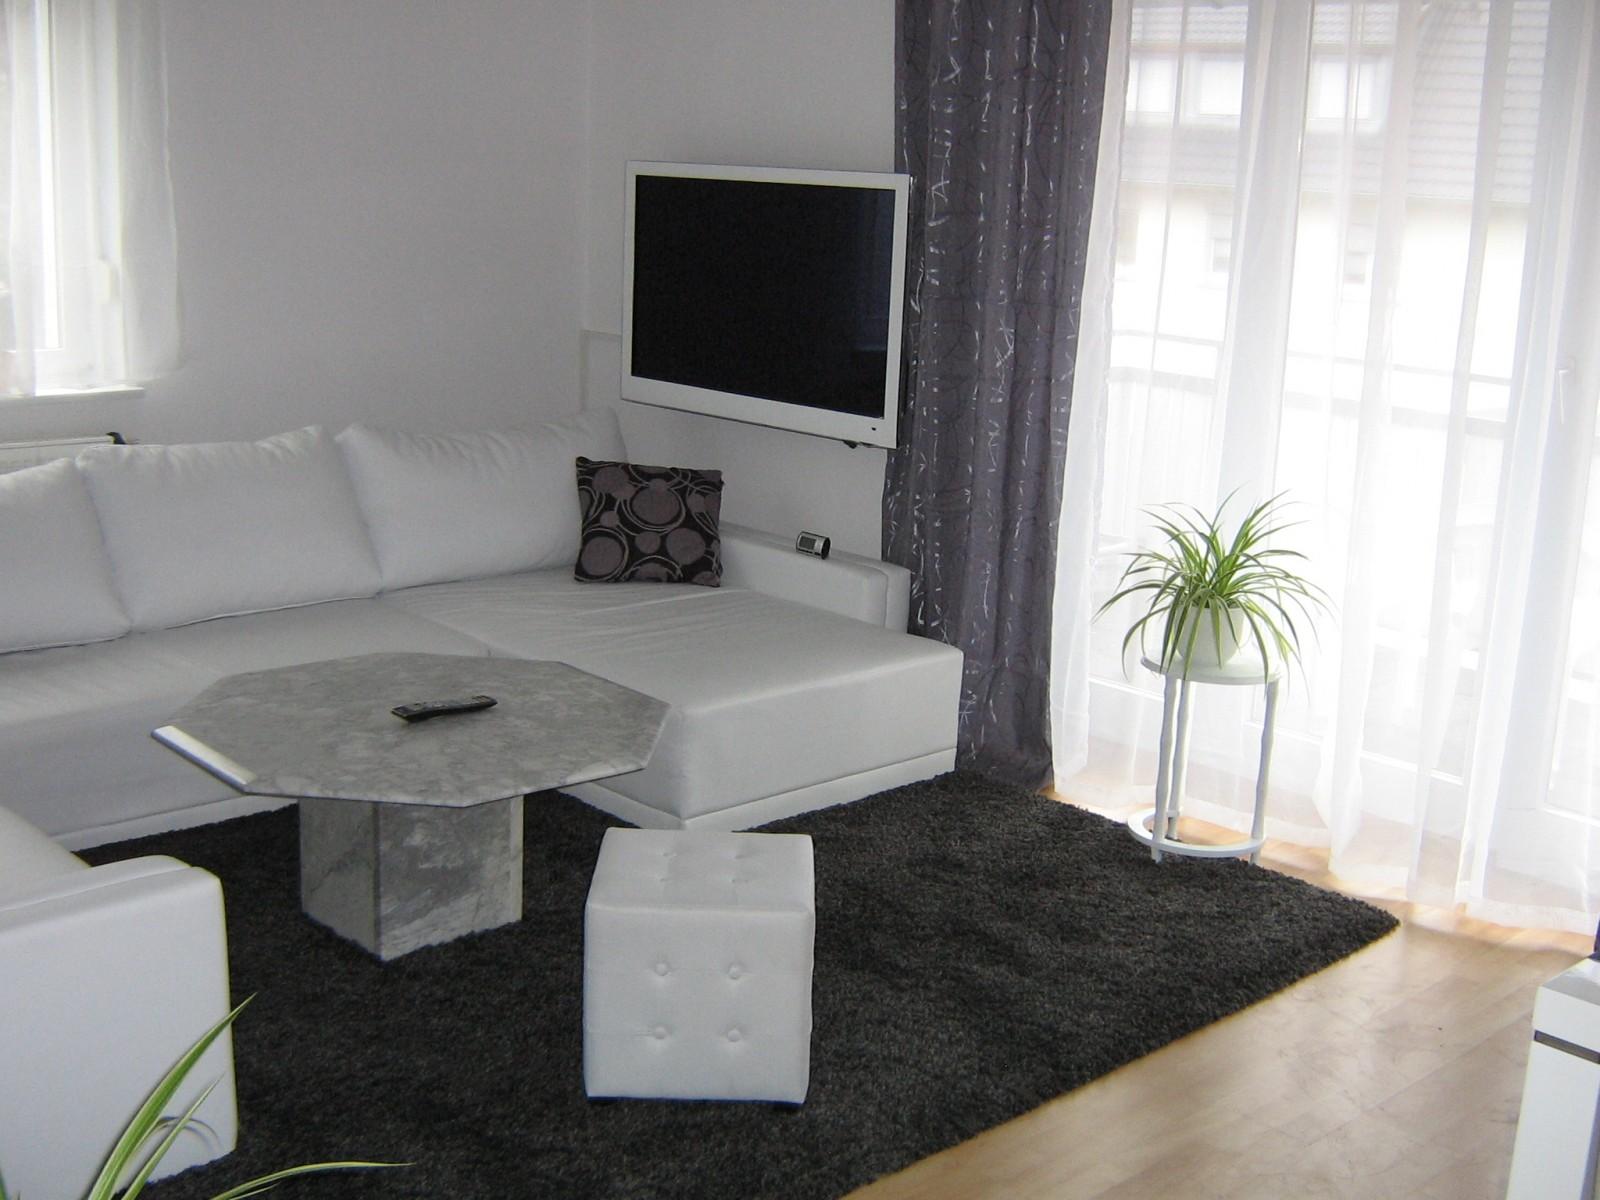 emejing gardinen wohnzimmer grun pictures house design ideas. Black Bedroom Furniture Sets. Home Design Ideas